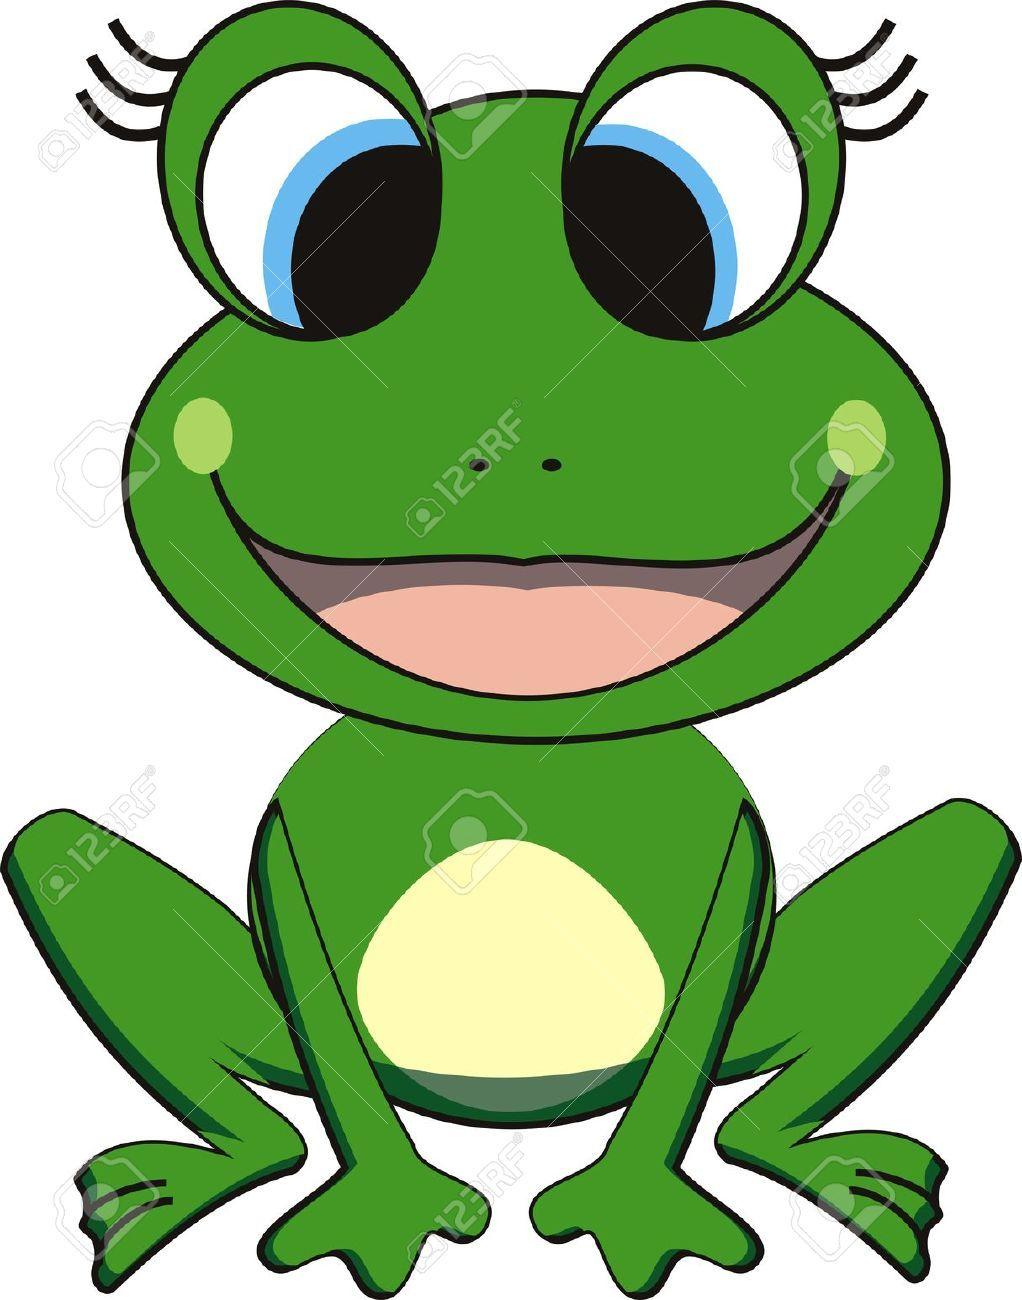 medium resolution of vector illustration of happy frog cliparts vector v stock h nh nh minh h a mi n ph b n quy n image 5156383